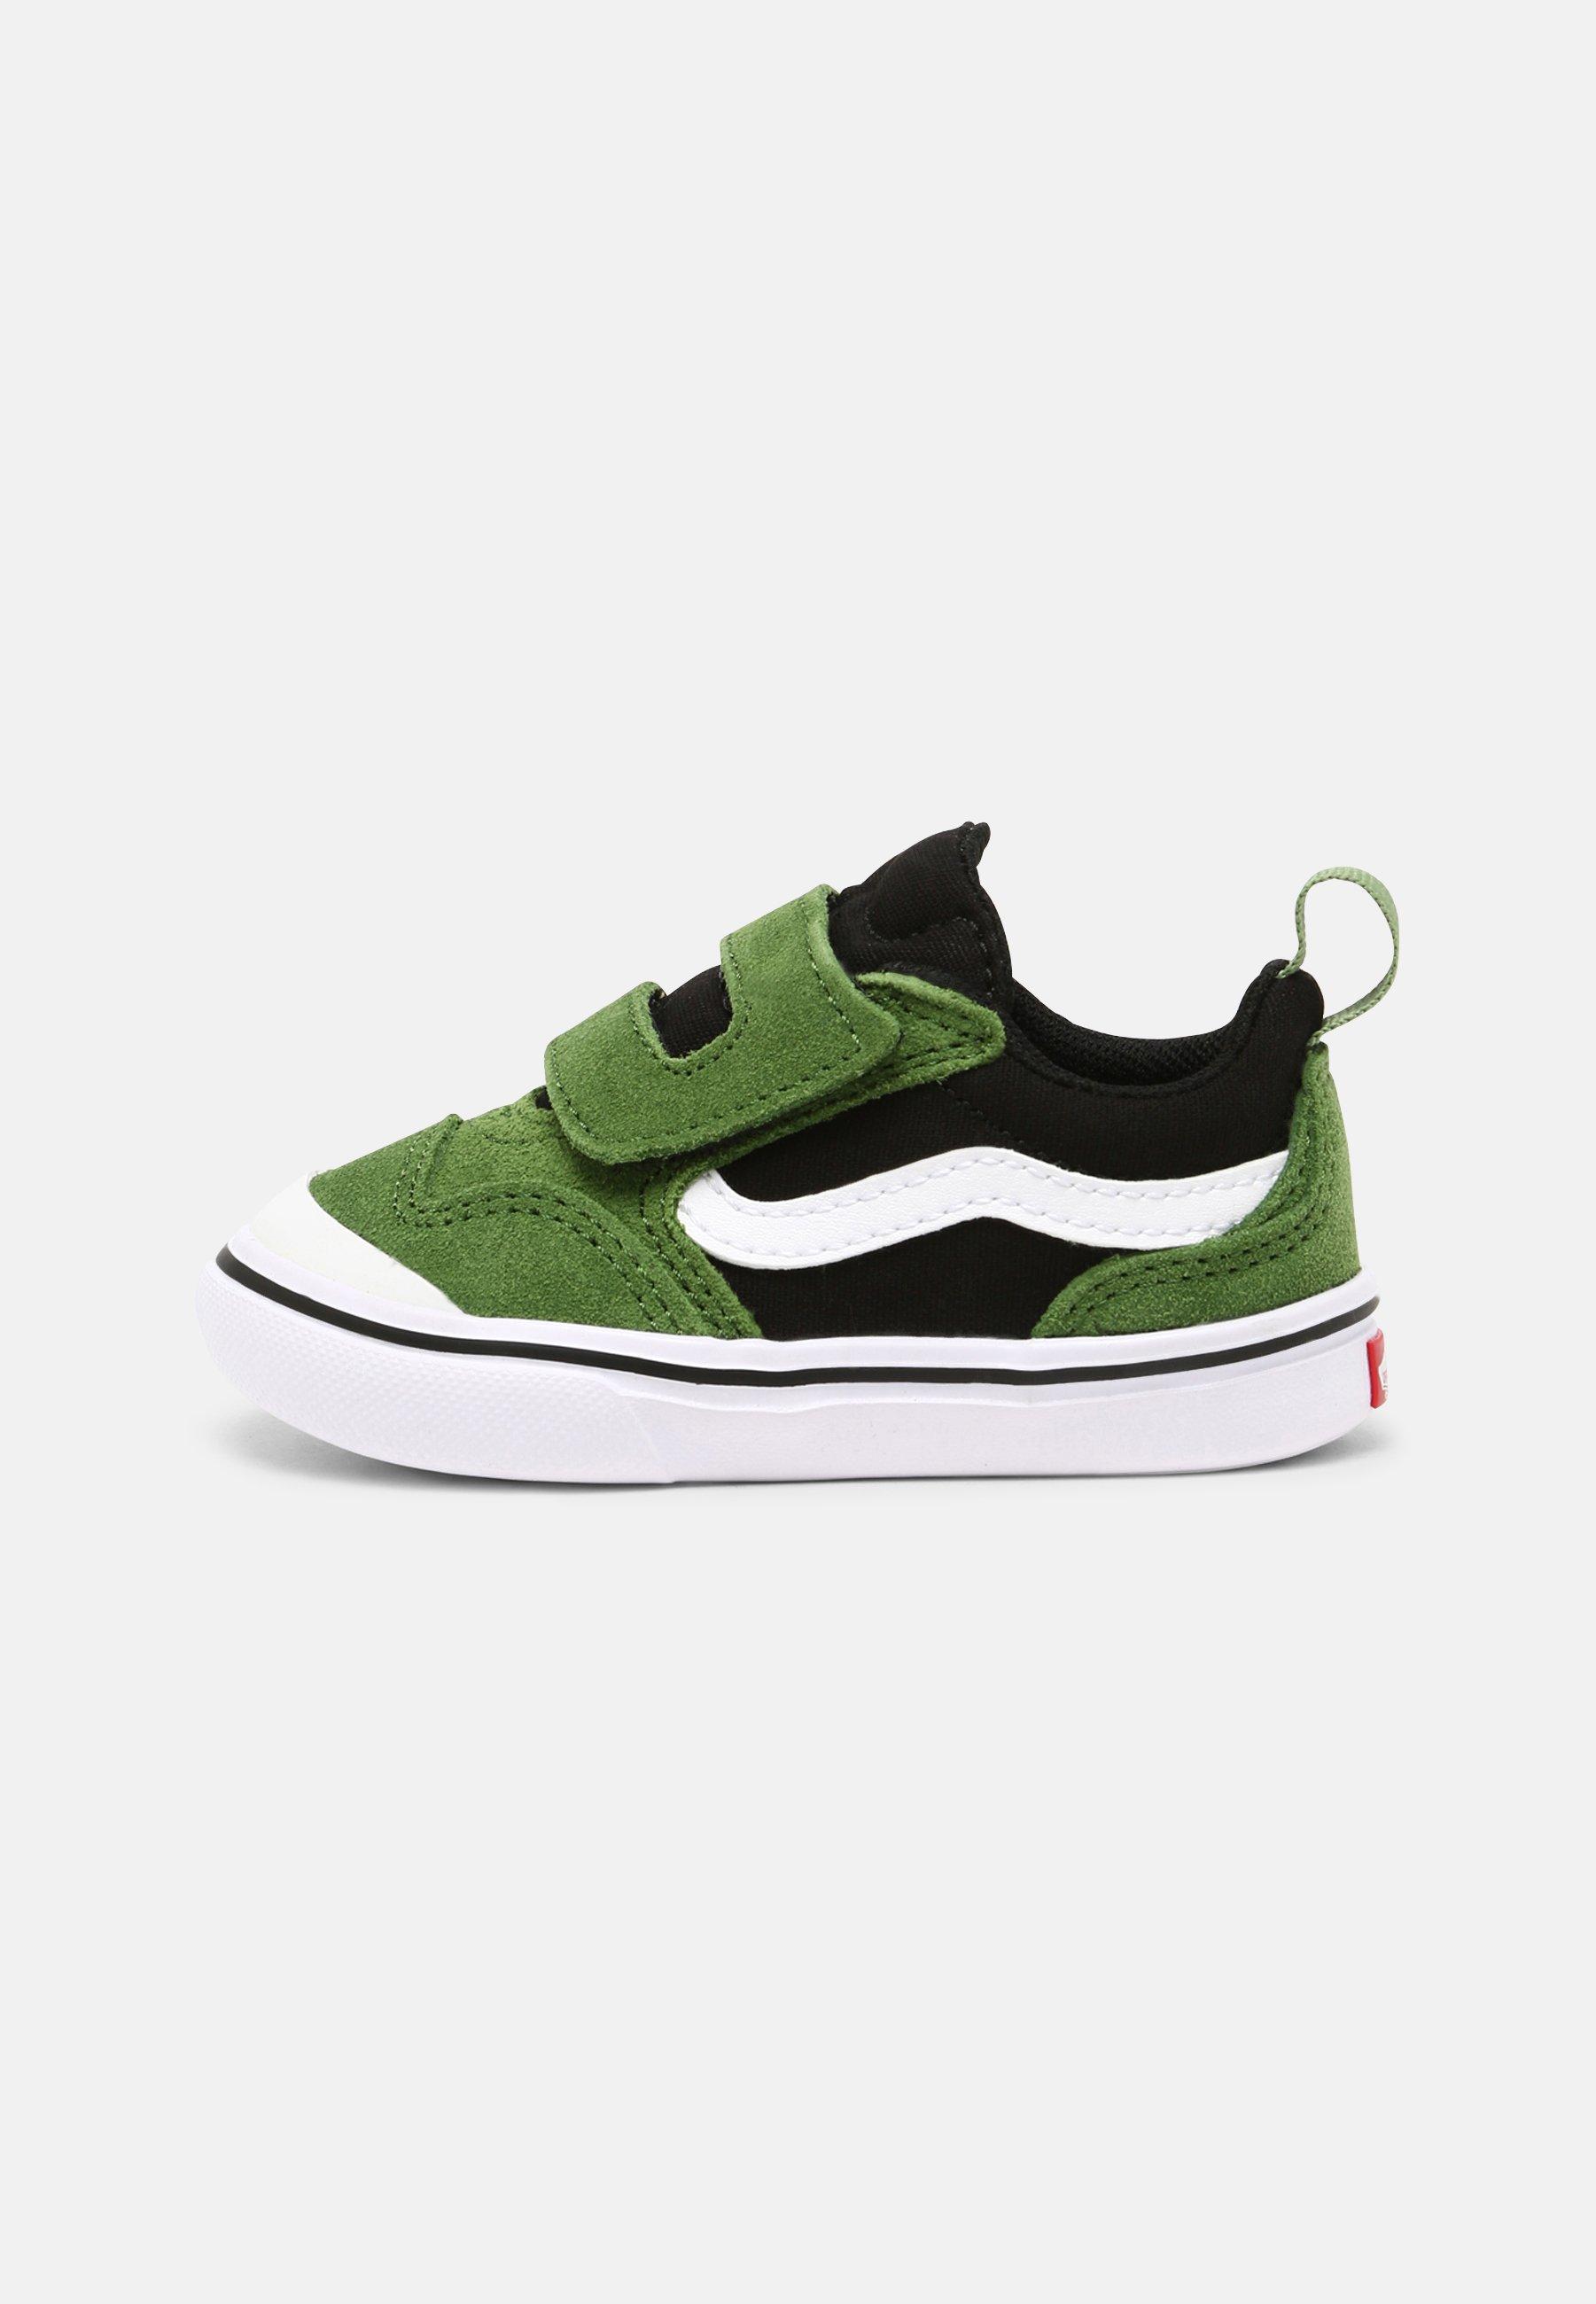 Enfant COMFYCUSH NEW SKOOL UNISEX - Chaussures de skate